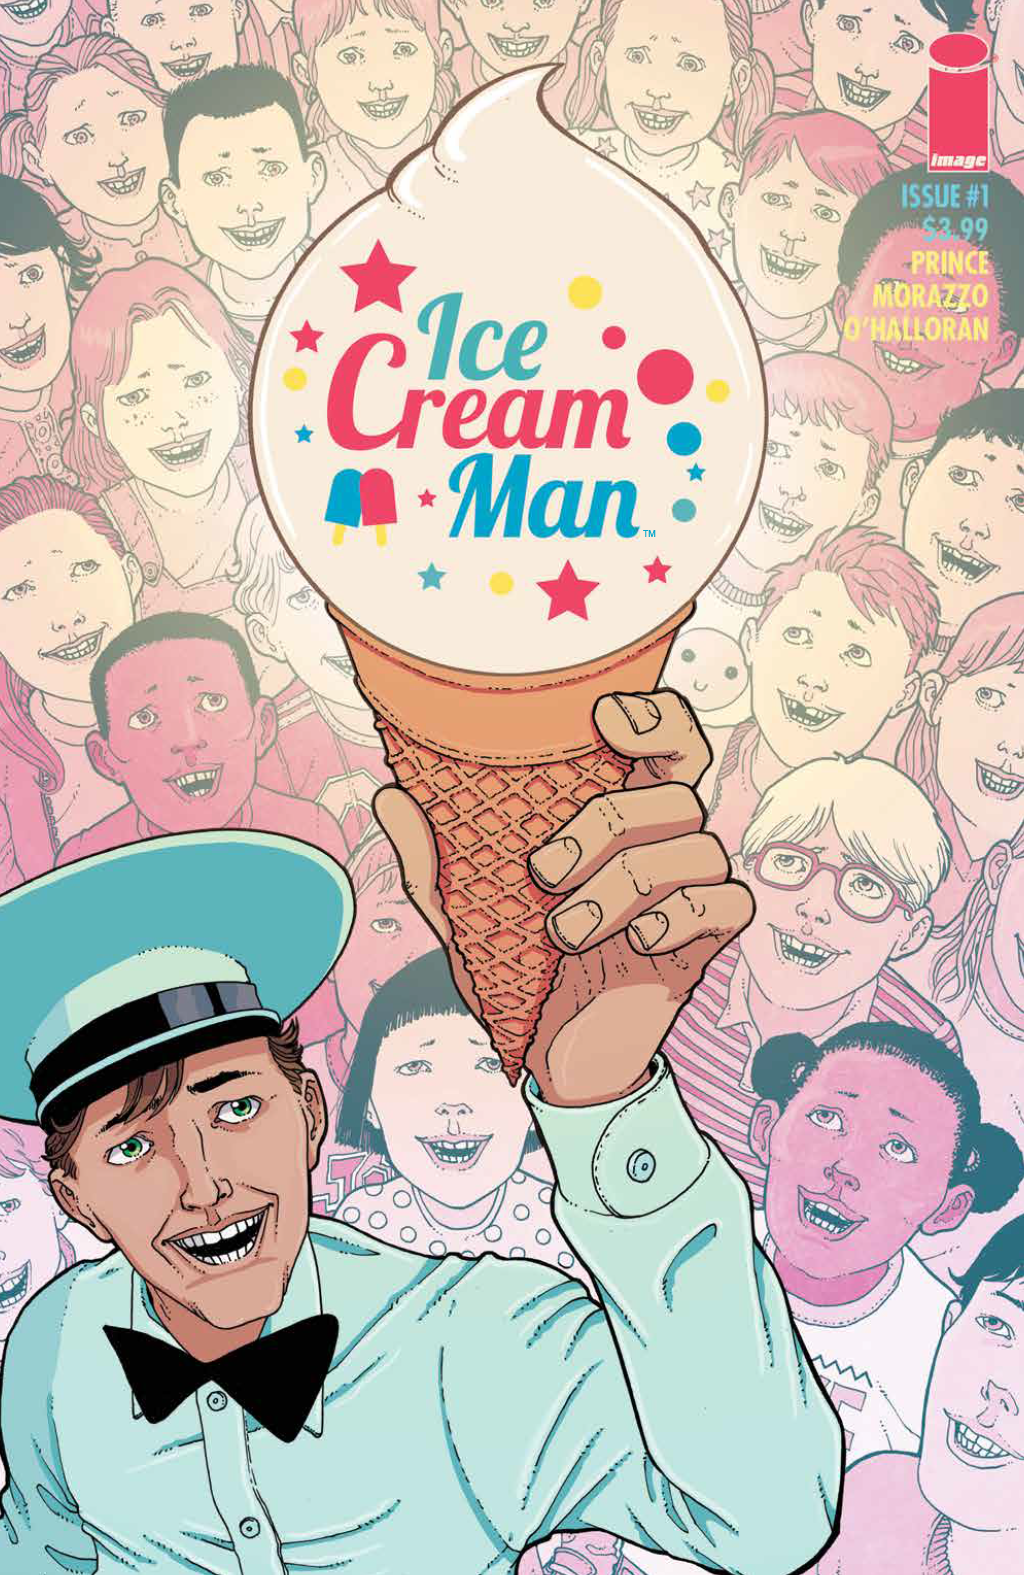 Ice Cream Man #1.png